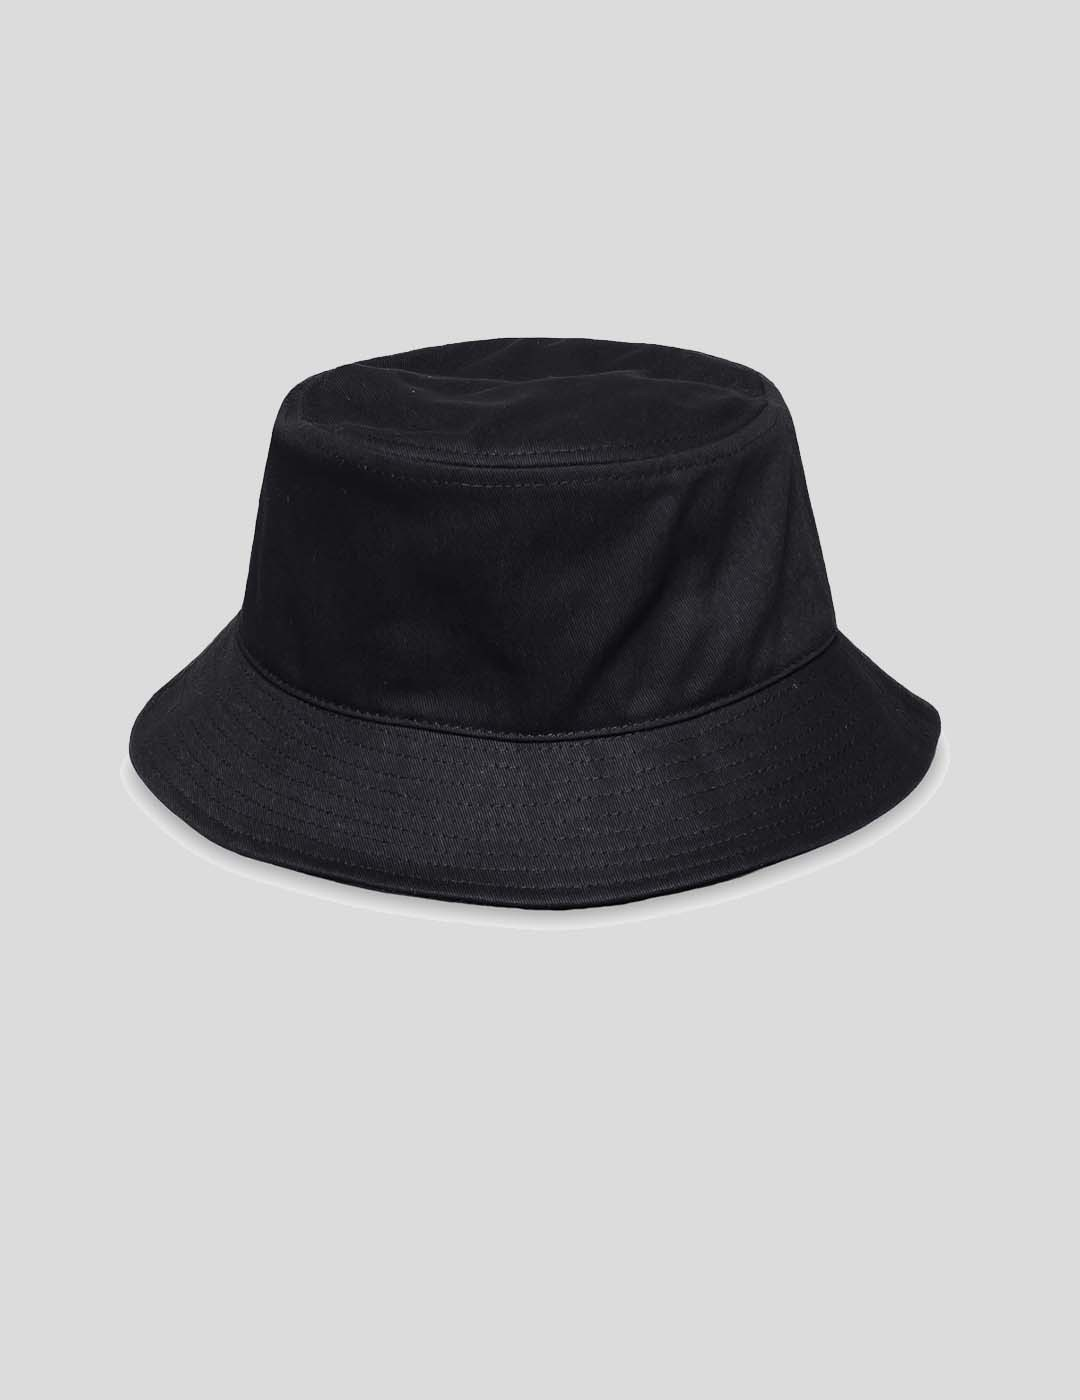 GORRO GRIMEY HOPE UNSEEN BUCKET HAT BLACK